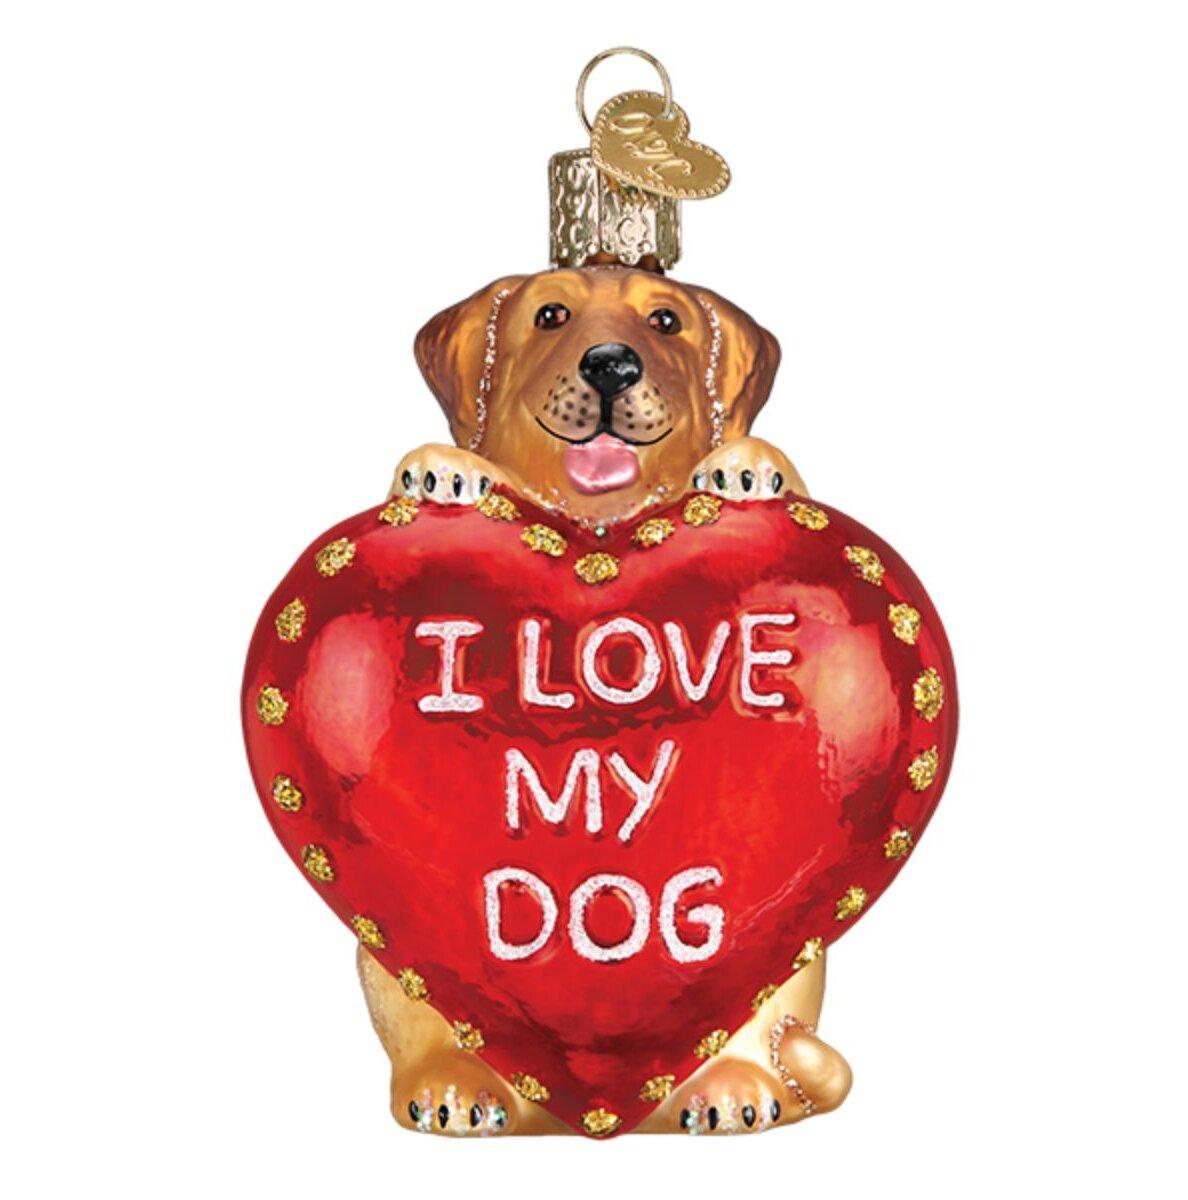 Old World Christmas I Love My Dog Hanging Figurine Ornament Wayfair